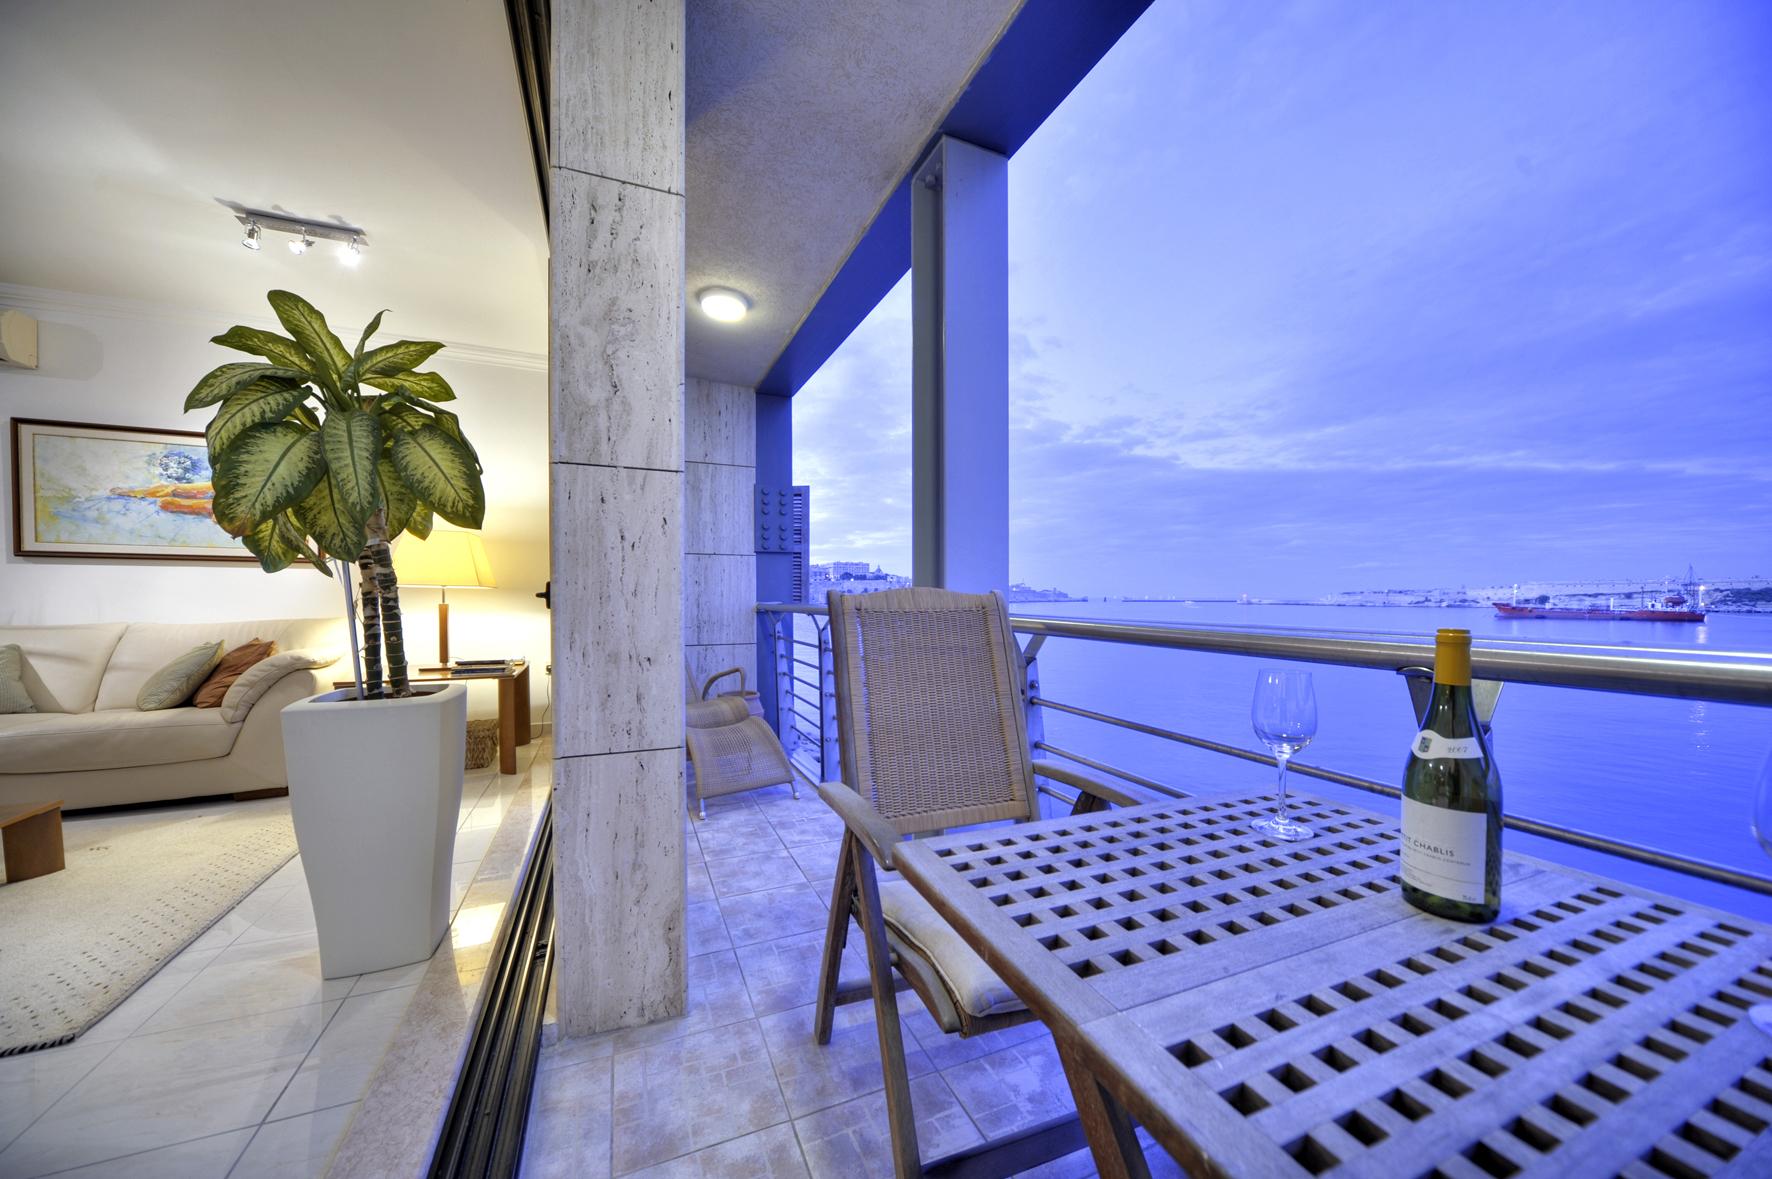 Property for Sale in Malta - Buy Malta Real Estate | Homes ...